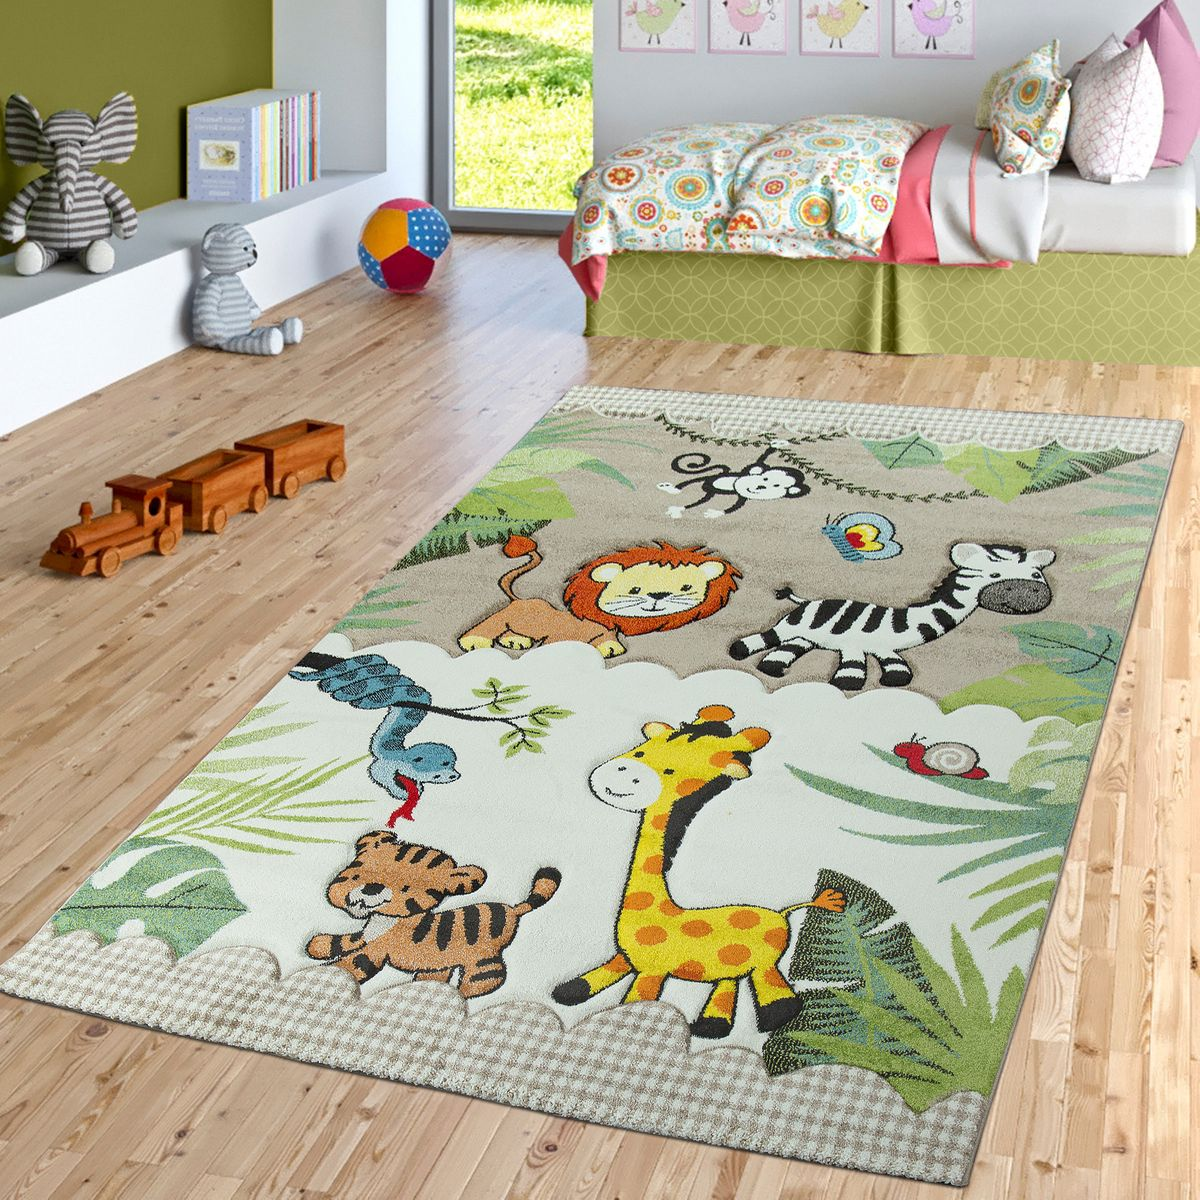 Schone Teppiche Fur Das Kinderzimmer Mummyandmini Com